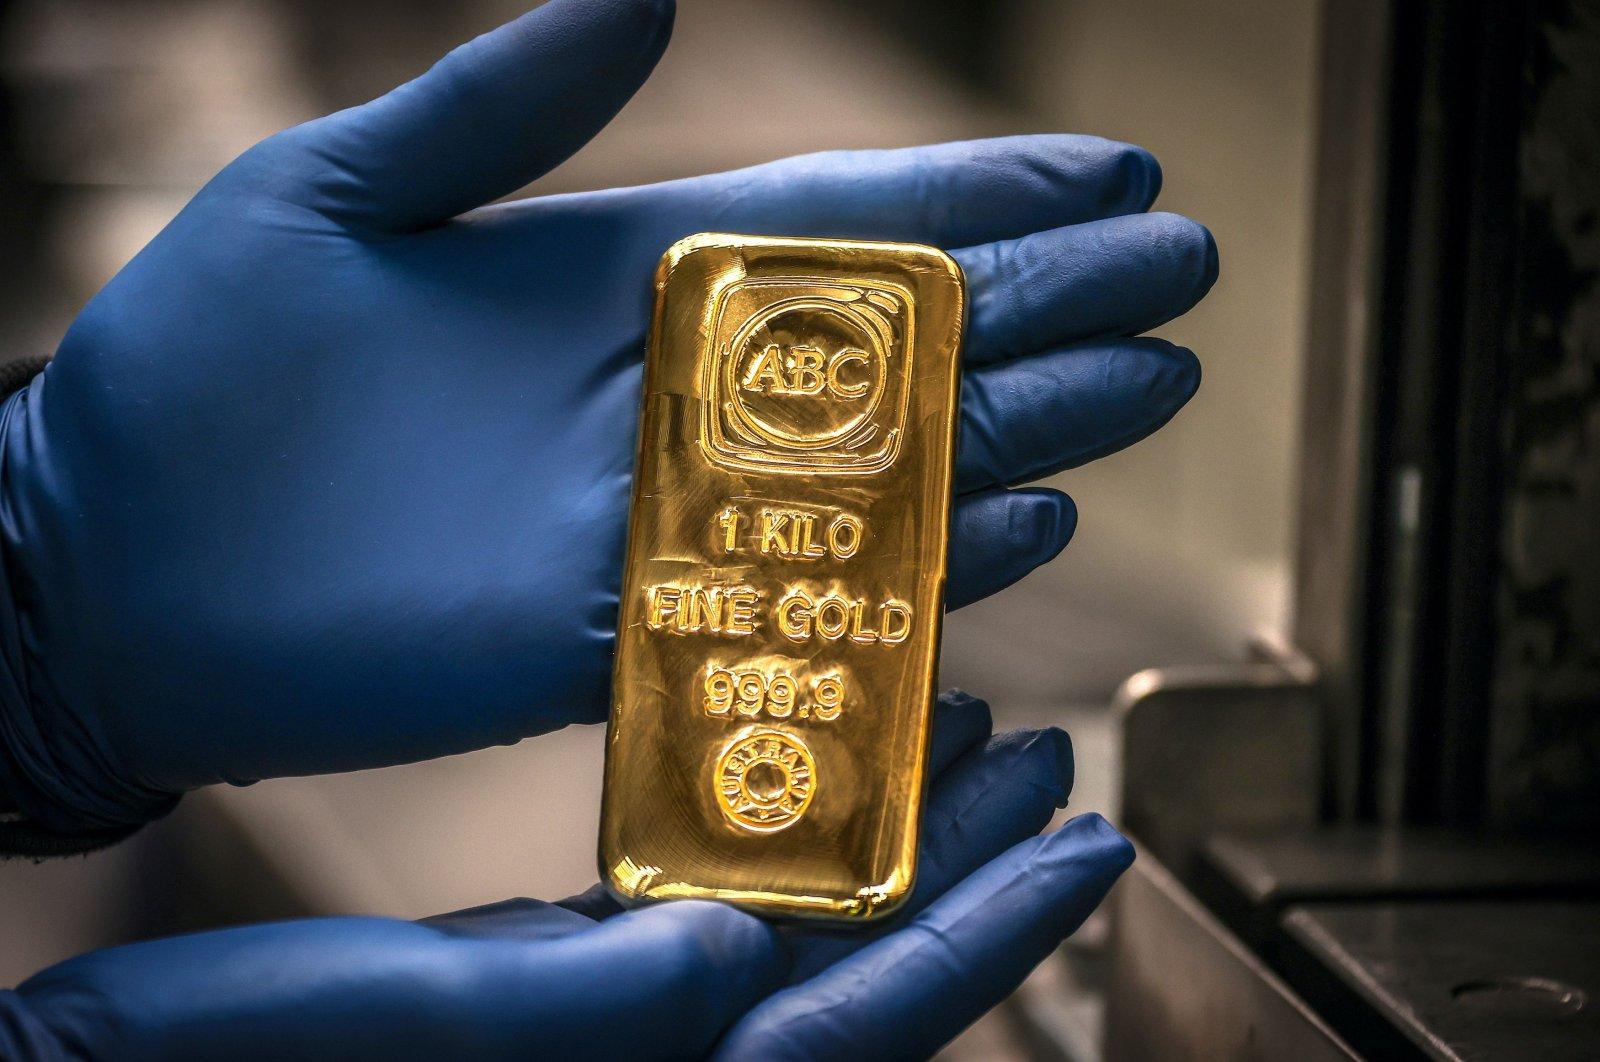 A worker displays a 1-kilogram gold bullion bar at the ABC Refinery in Sydney, Australia, Aug. 5, 2020. (AFP Photo)